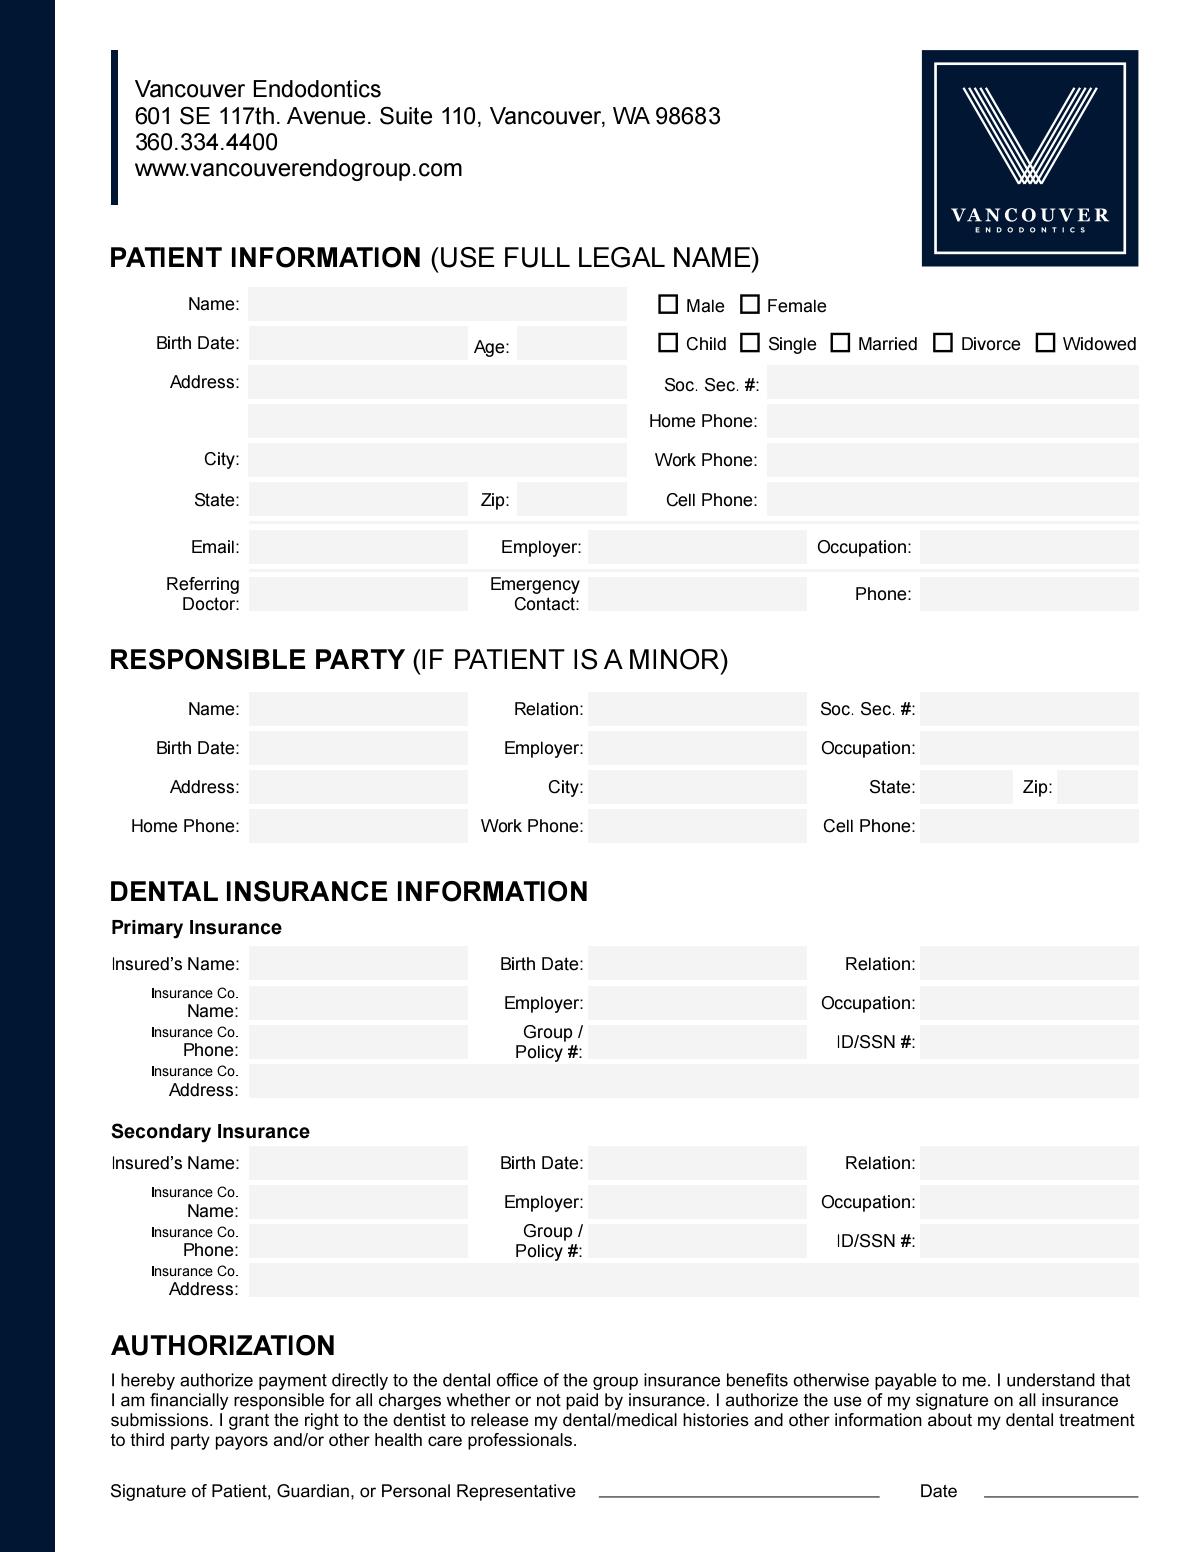 Redesign Form Vancouver Endodontics